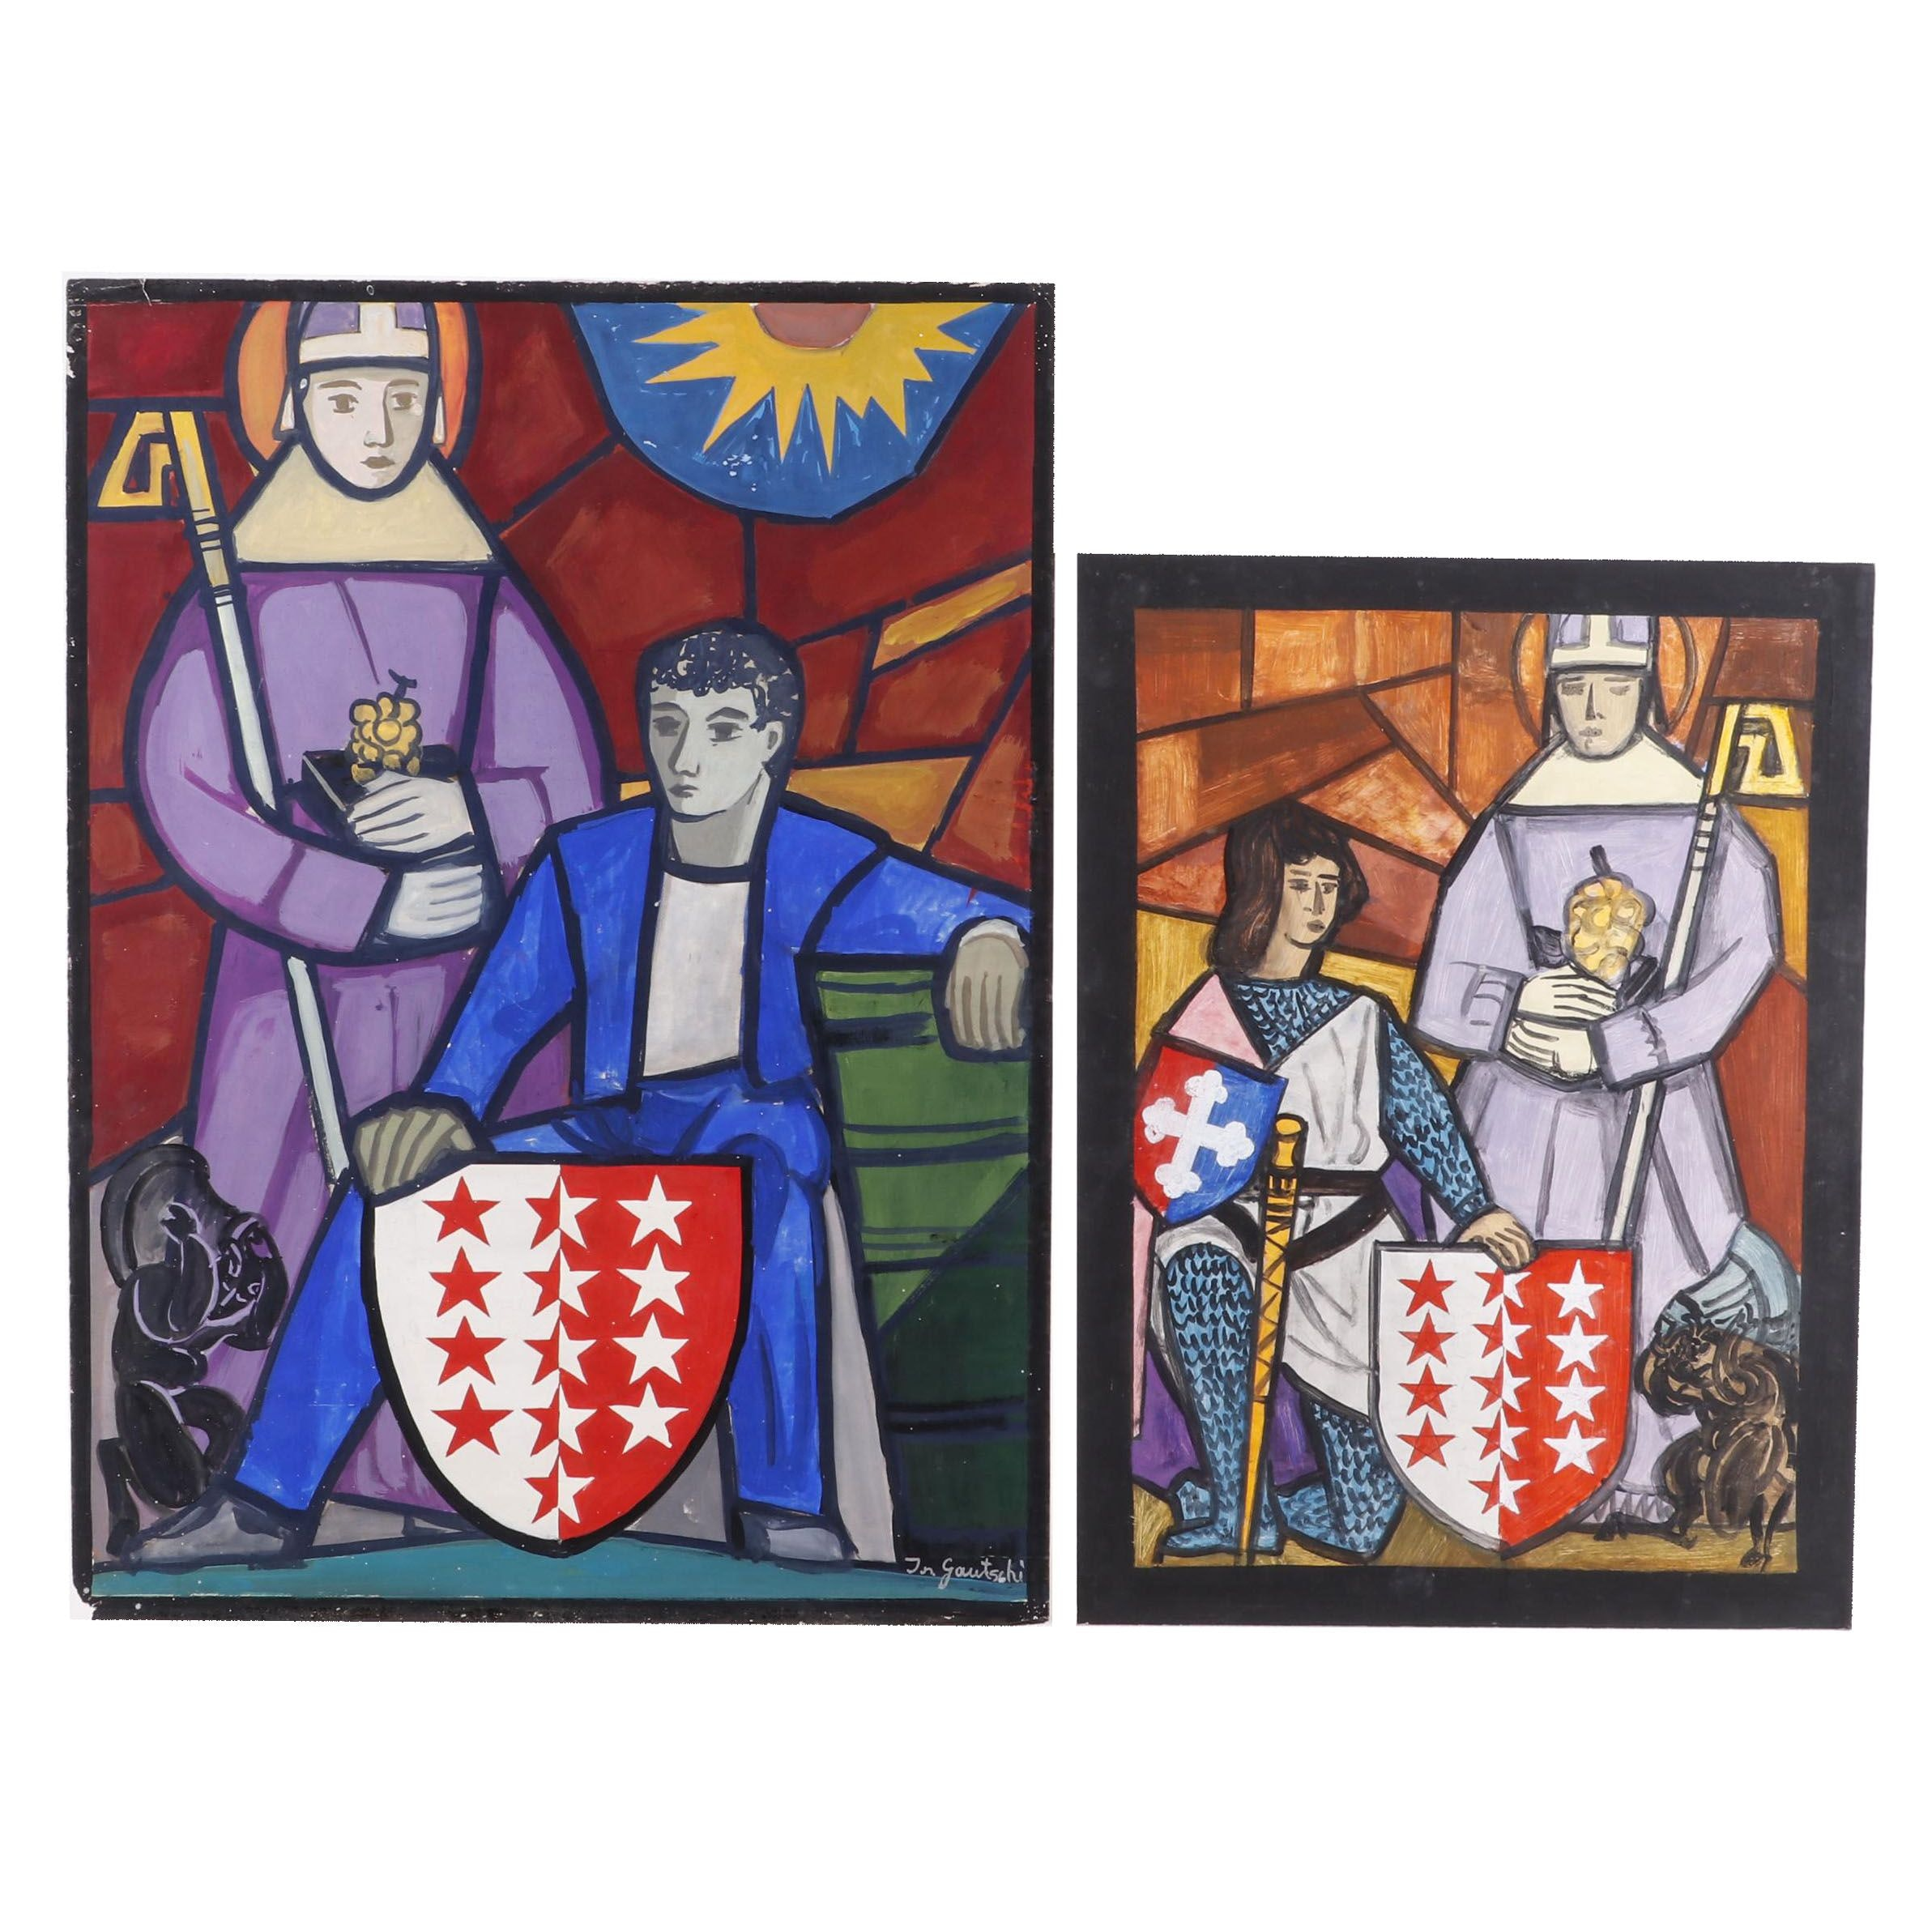 Joseph Gautschi Medieval Style Figural Acrylic Paintings